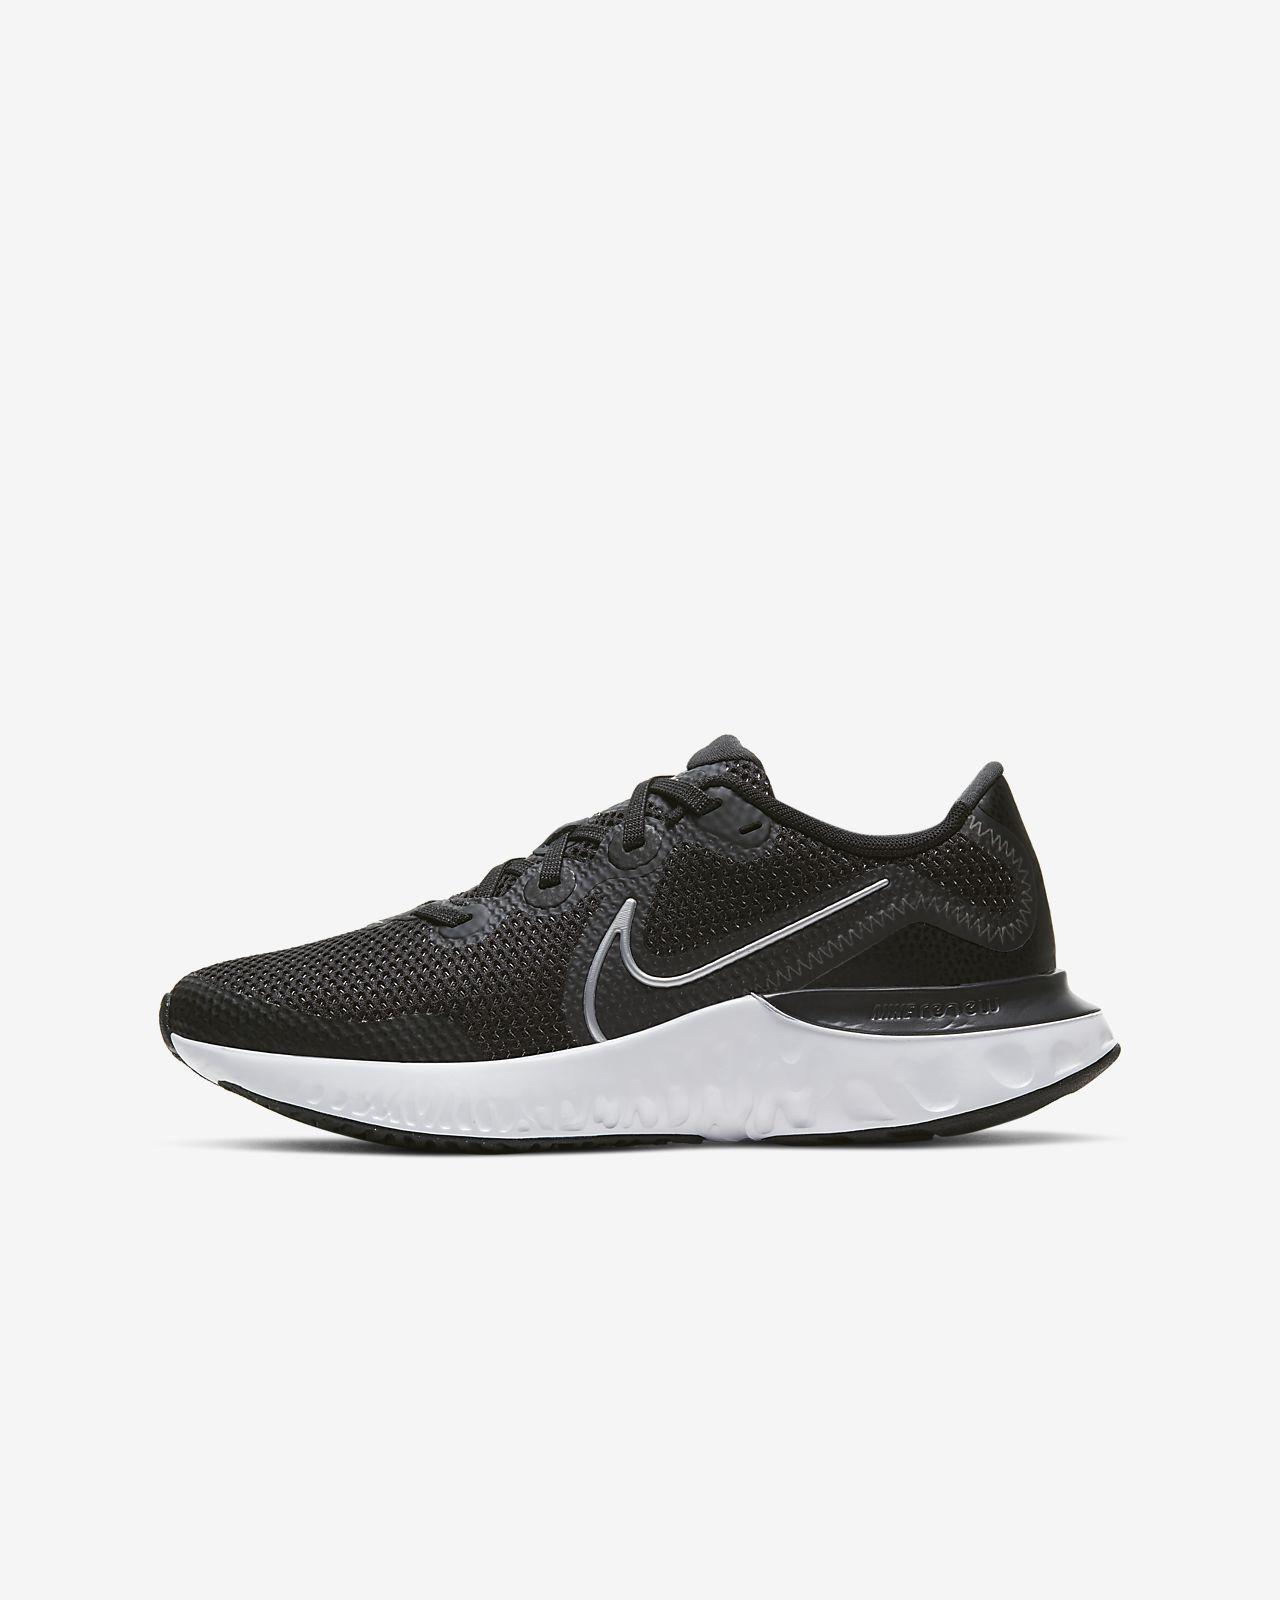 Nike Renew Run Laufschuh für ältere Kinder